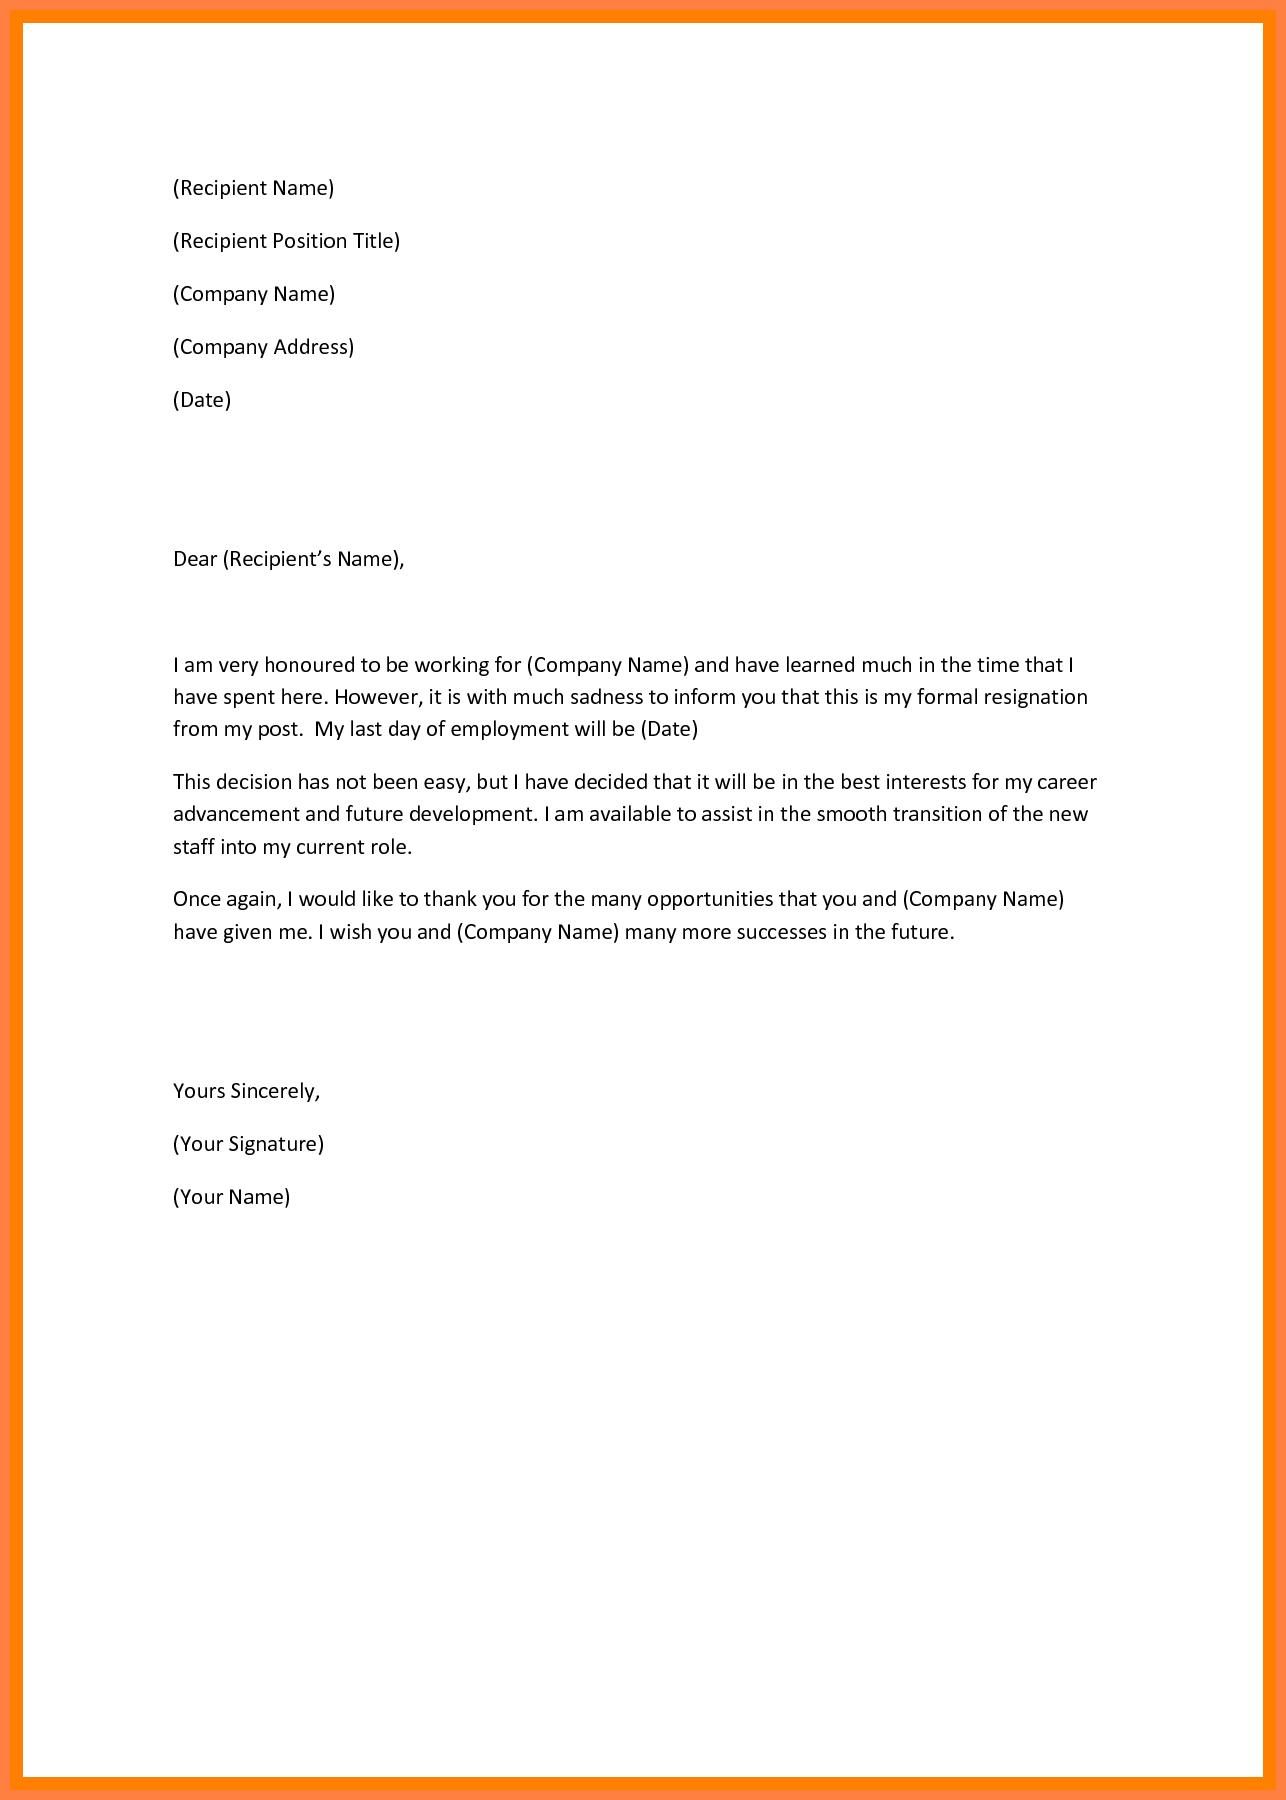 Sample Resignation Letter Singapore  Corpus Beat Inside Template For Resignation Letter Singapore